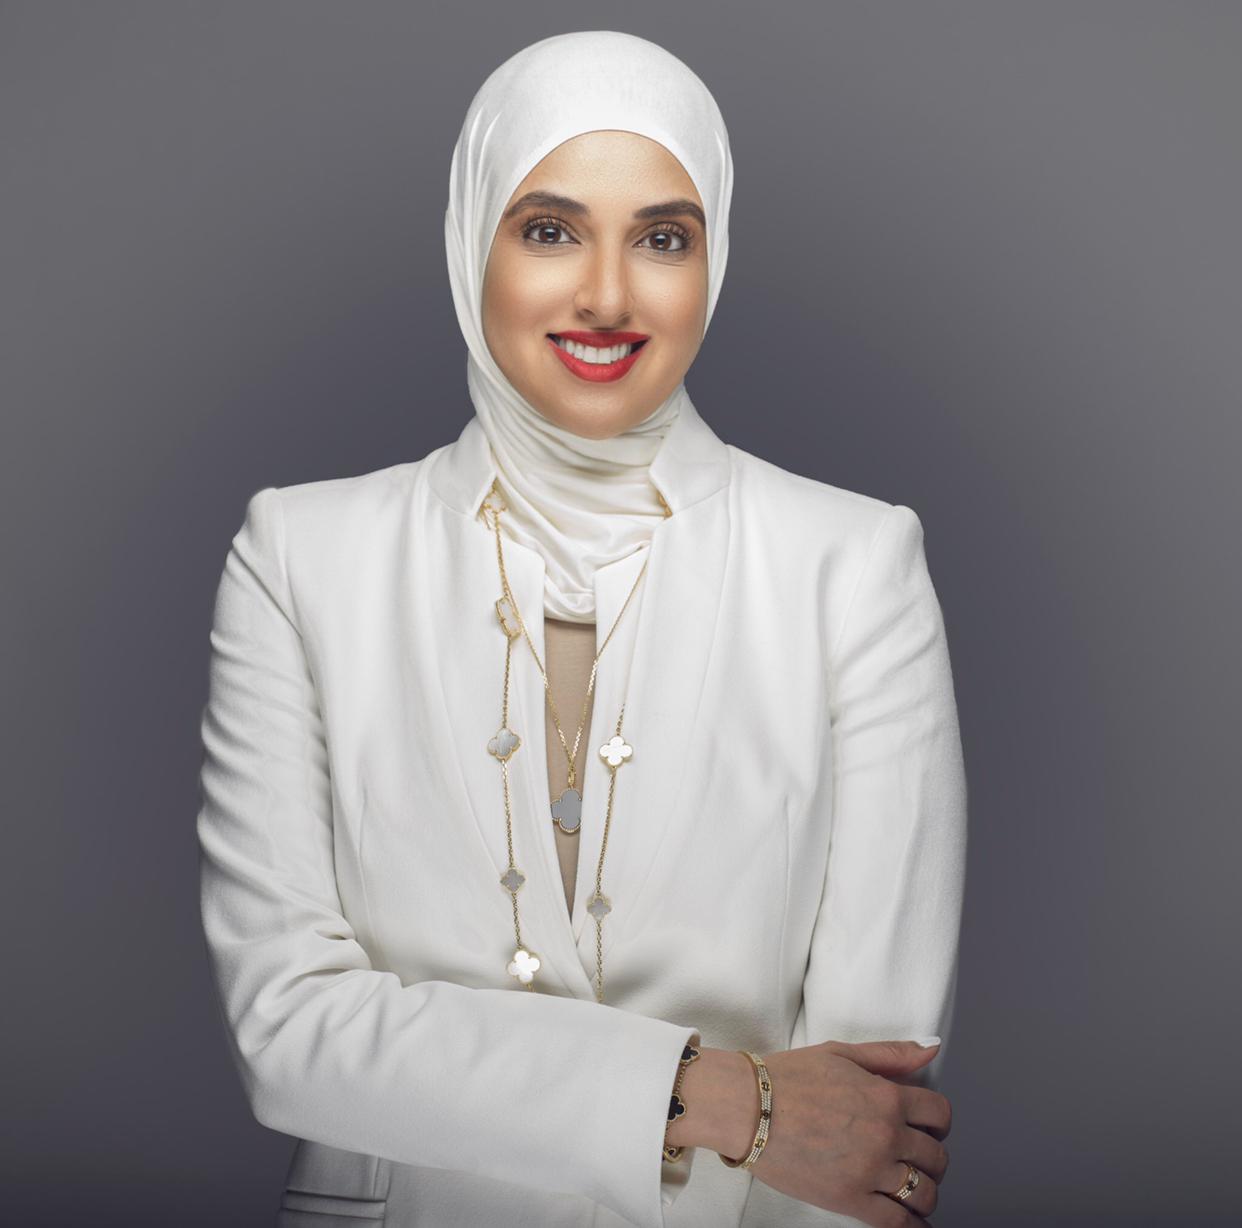 Hala Al Humaidhi